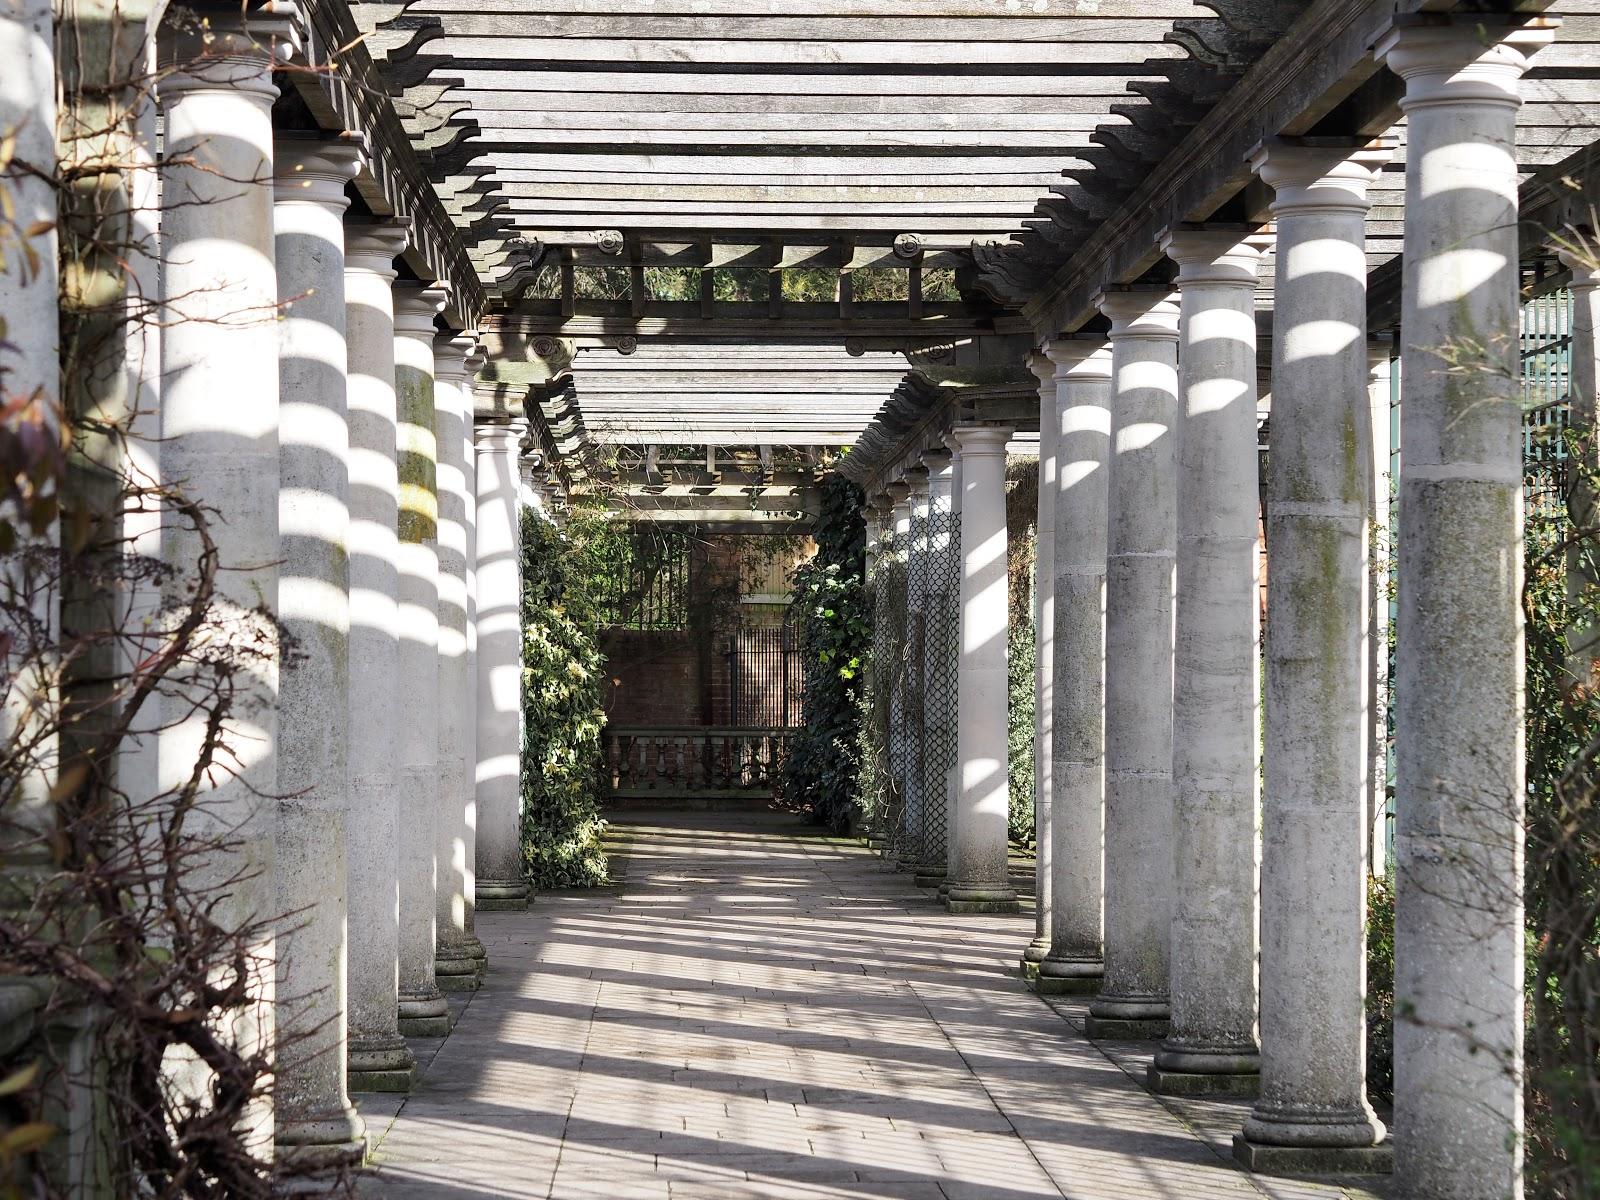 pillars with the sun shining though on Hampstead Heath